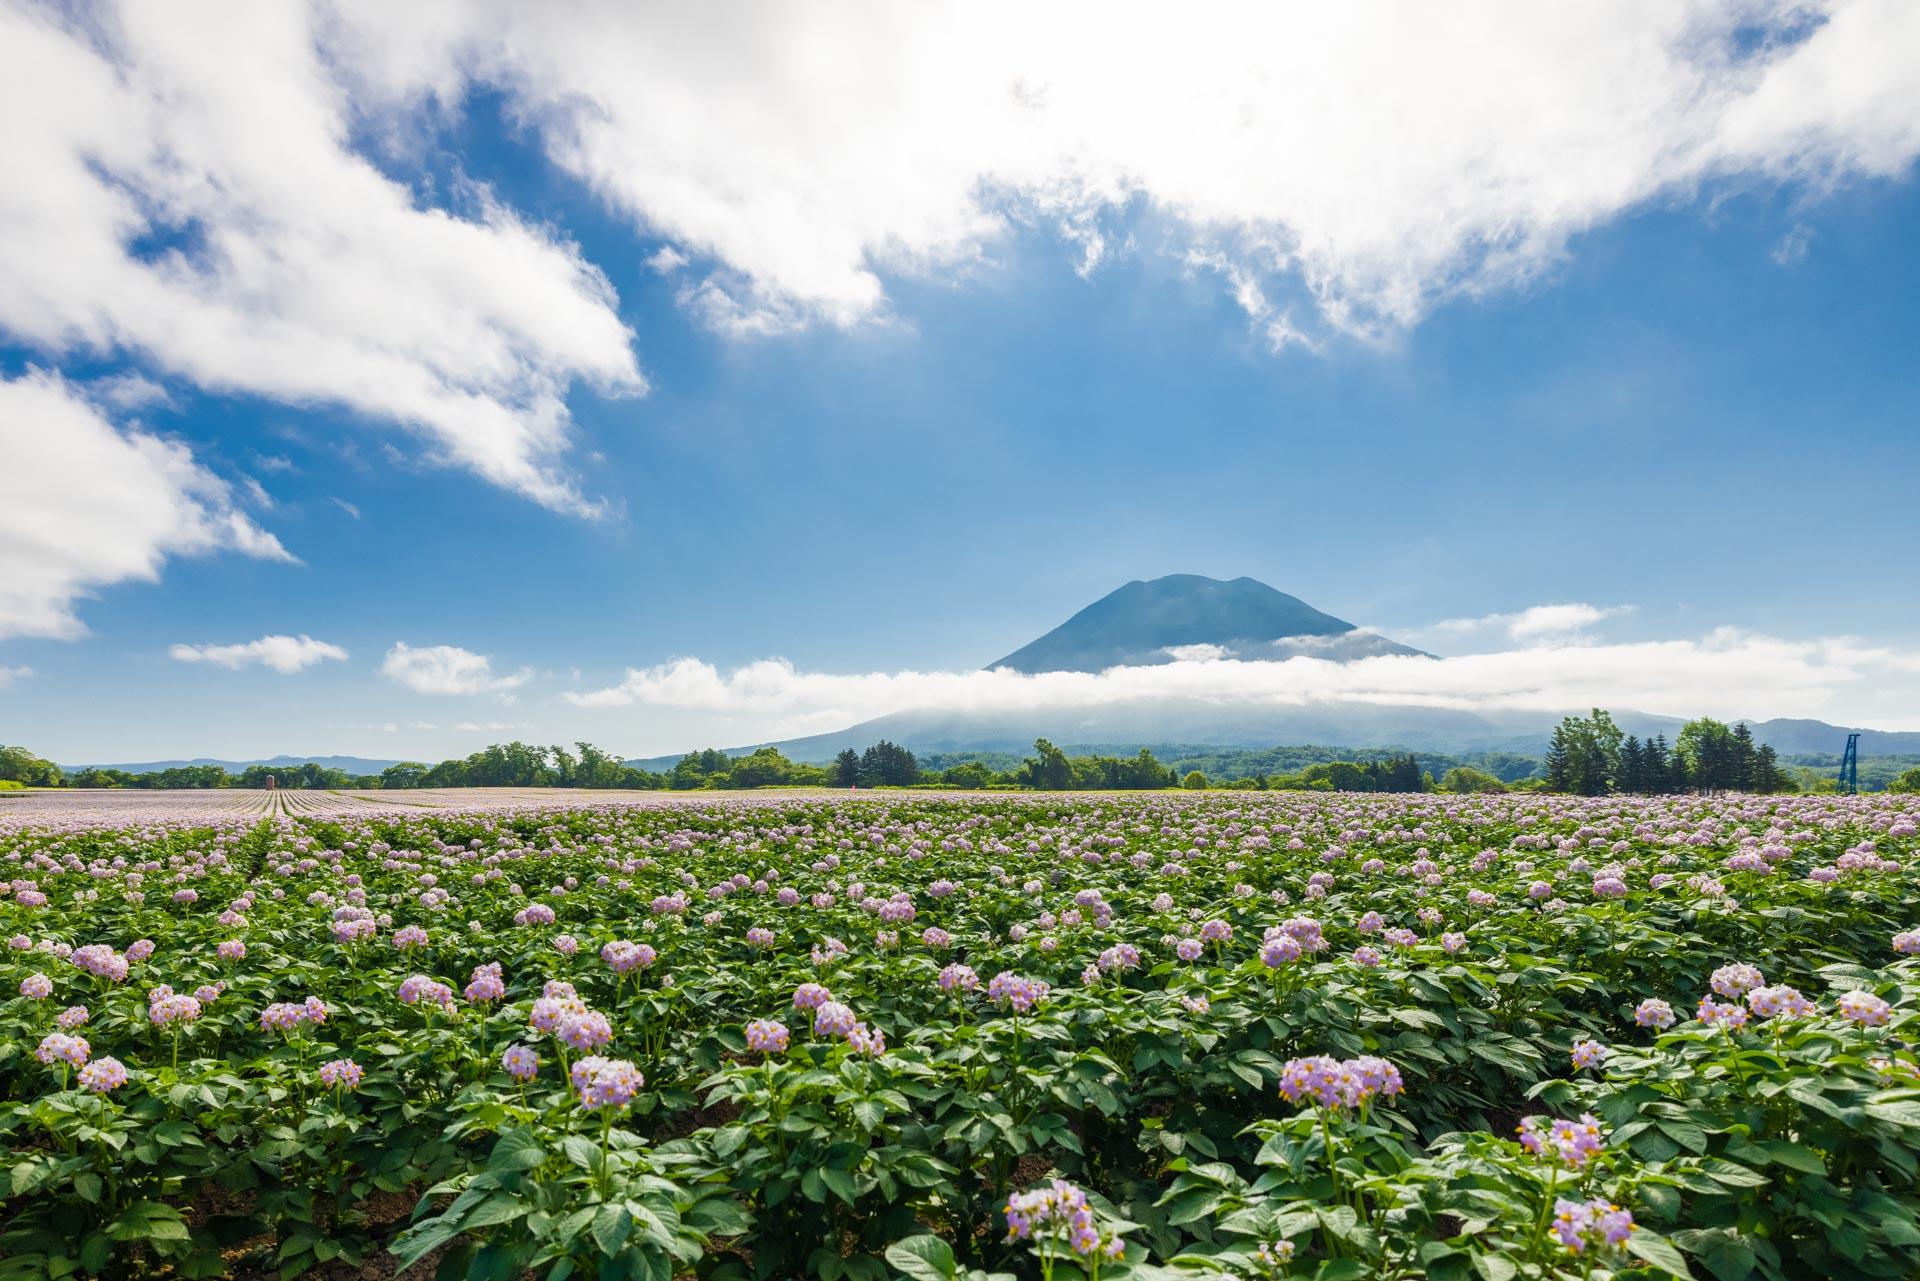 Yotei and Farms